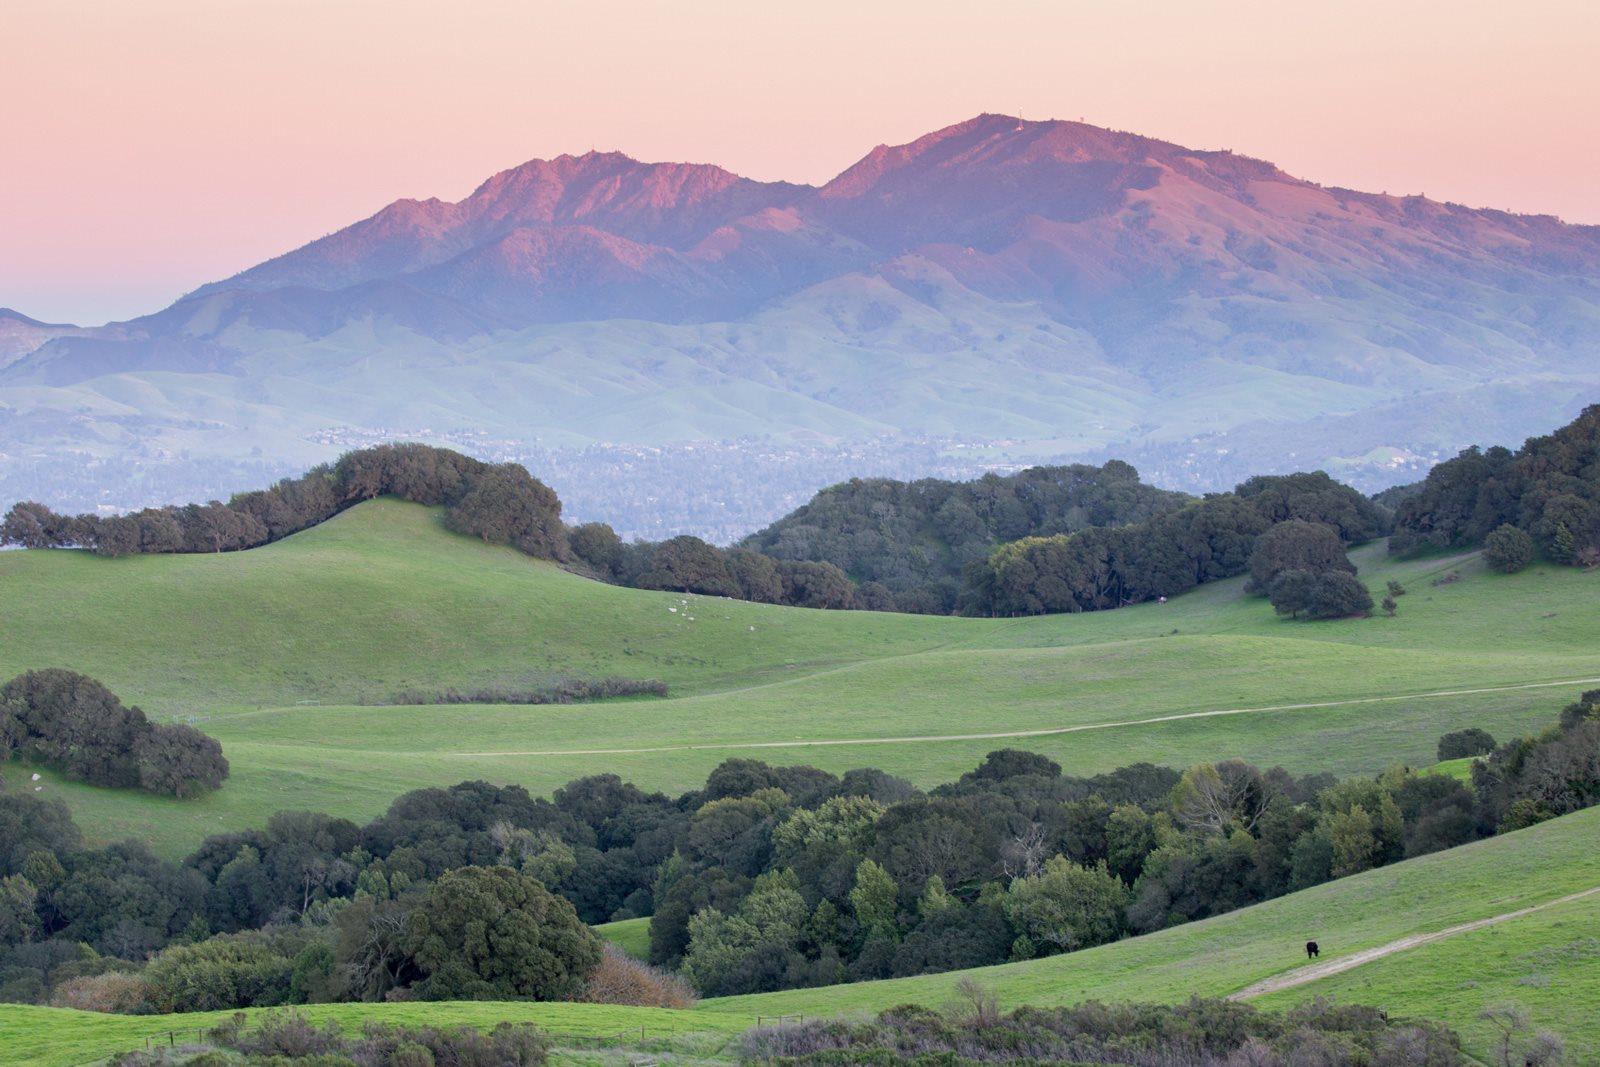 views of Mount Diablo. From Villa Montanaro, California